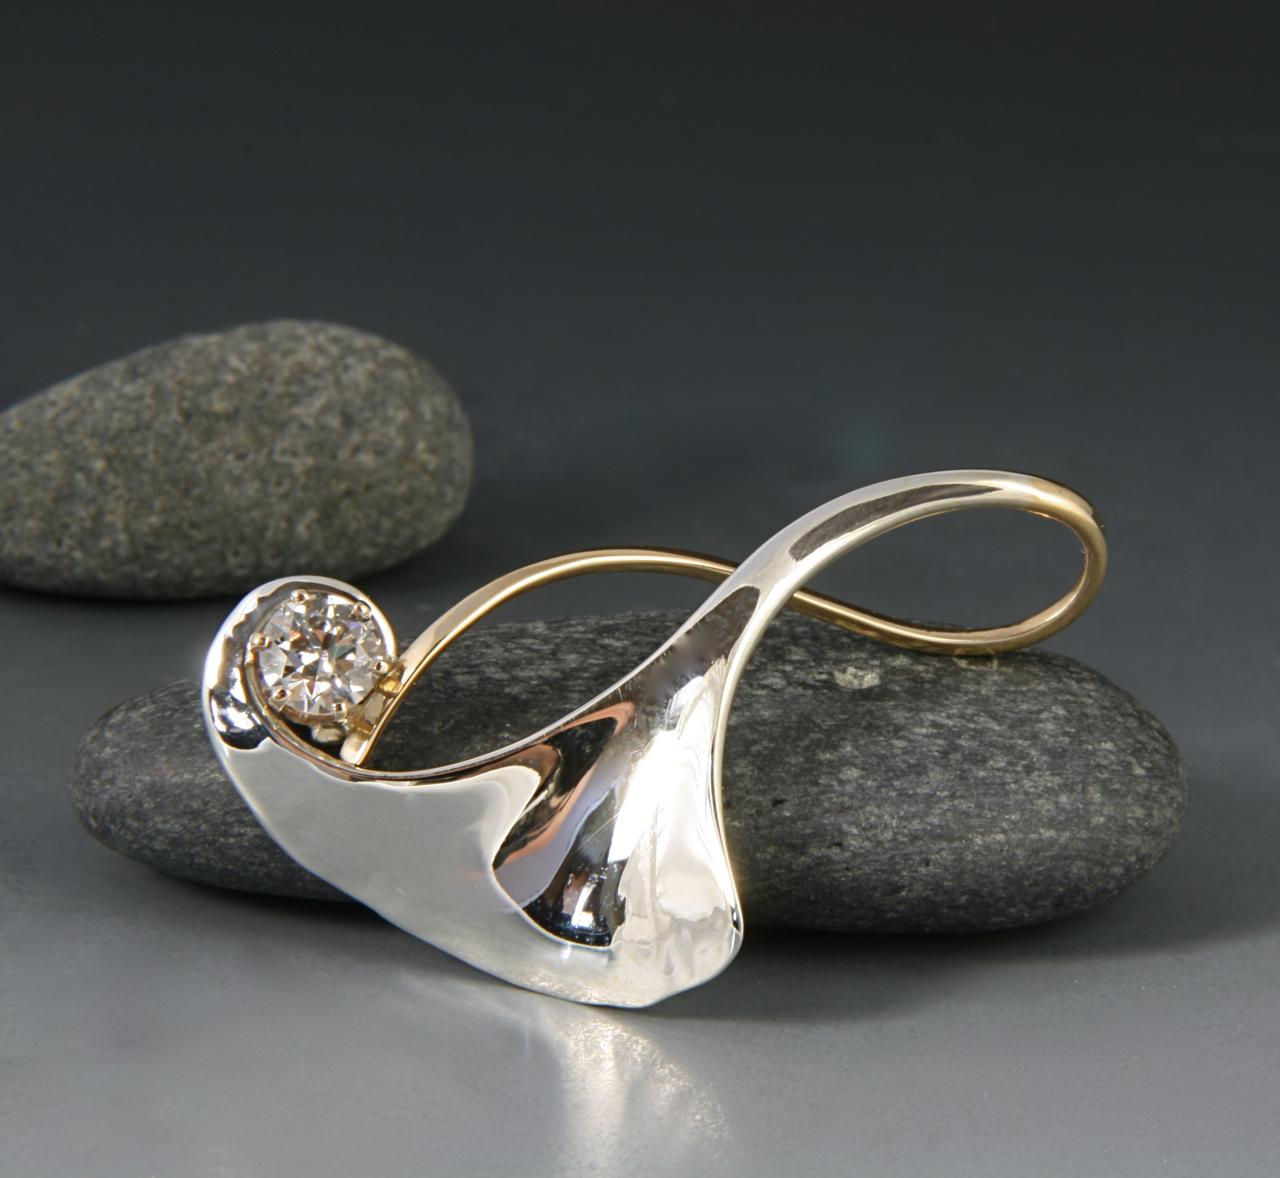 GINGKO PENDANT WITH DIAMOND